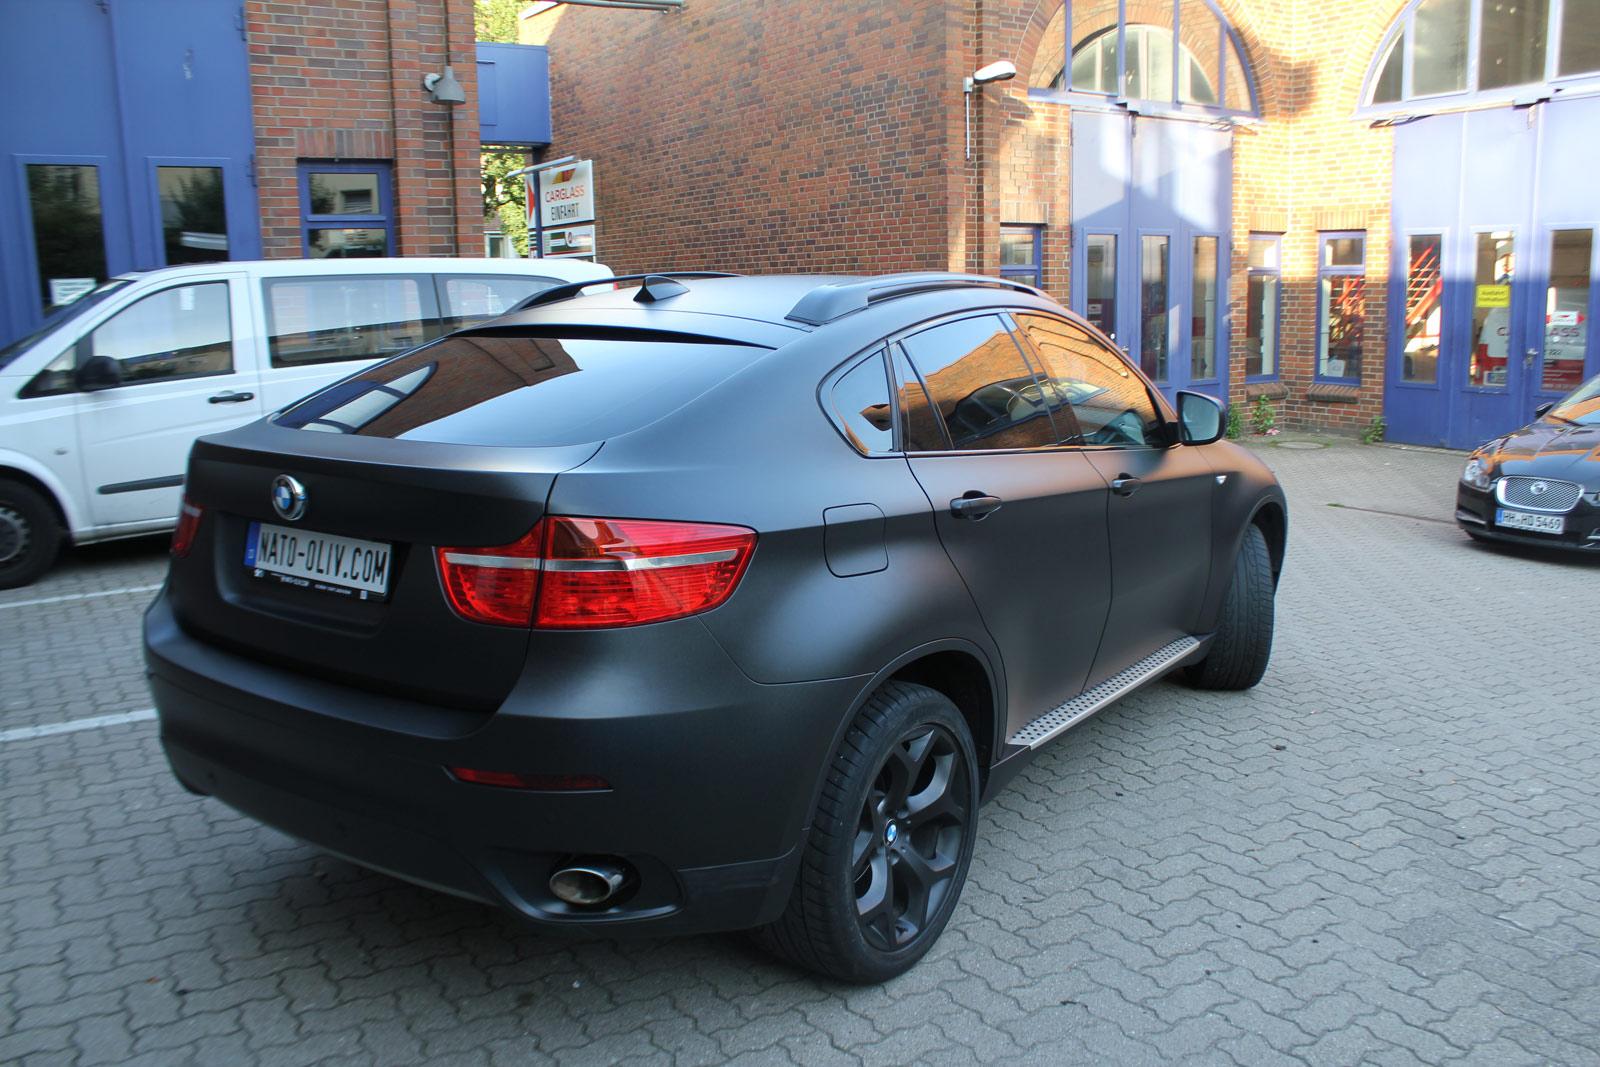 BMW_X6_FOLIERUNG_SCHWARZ_METALLIC_MATT_14